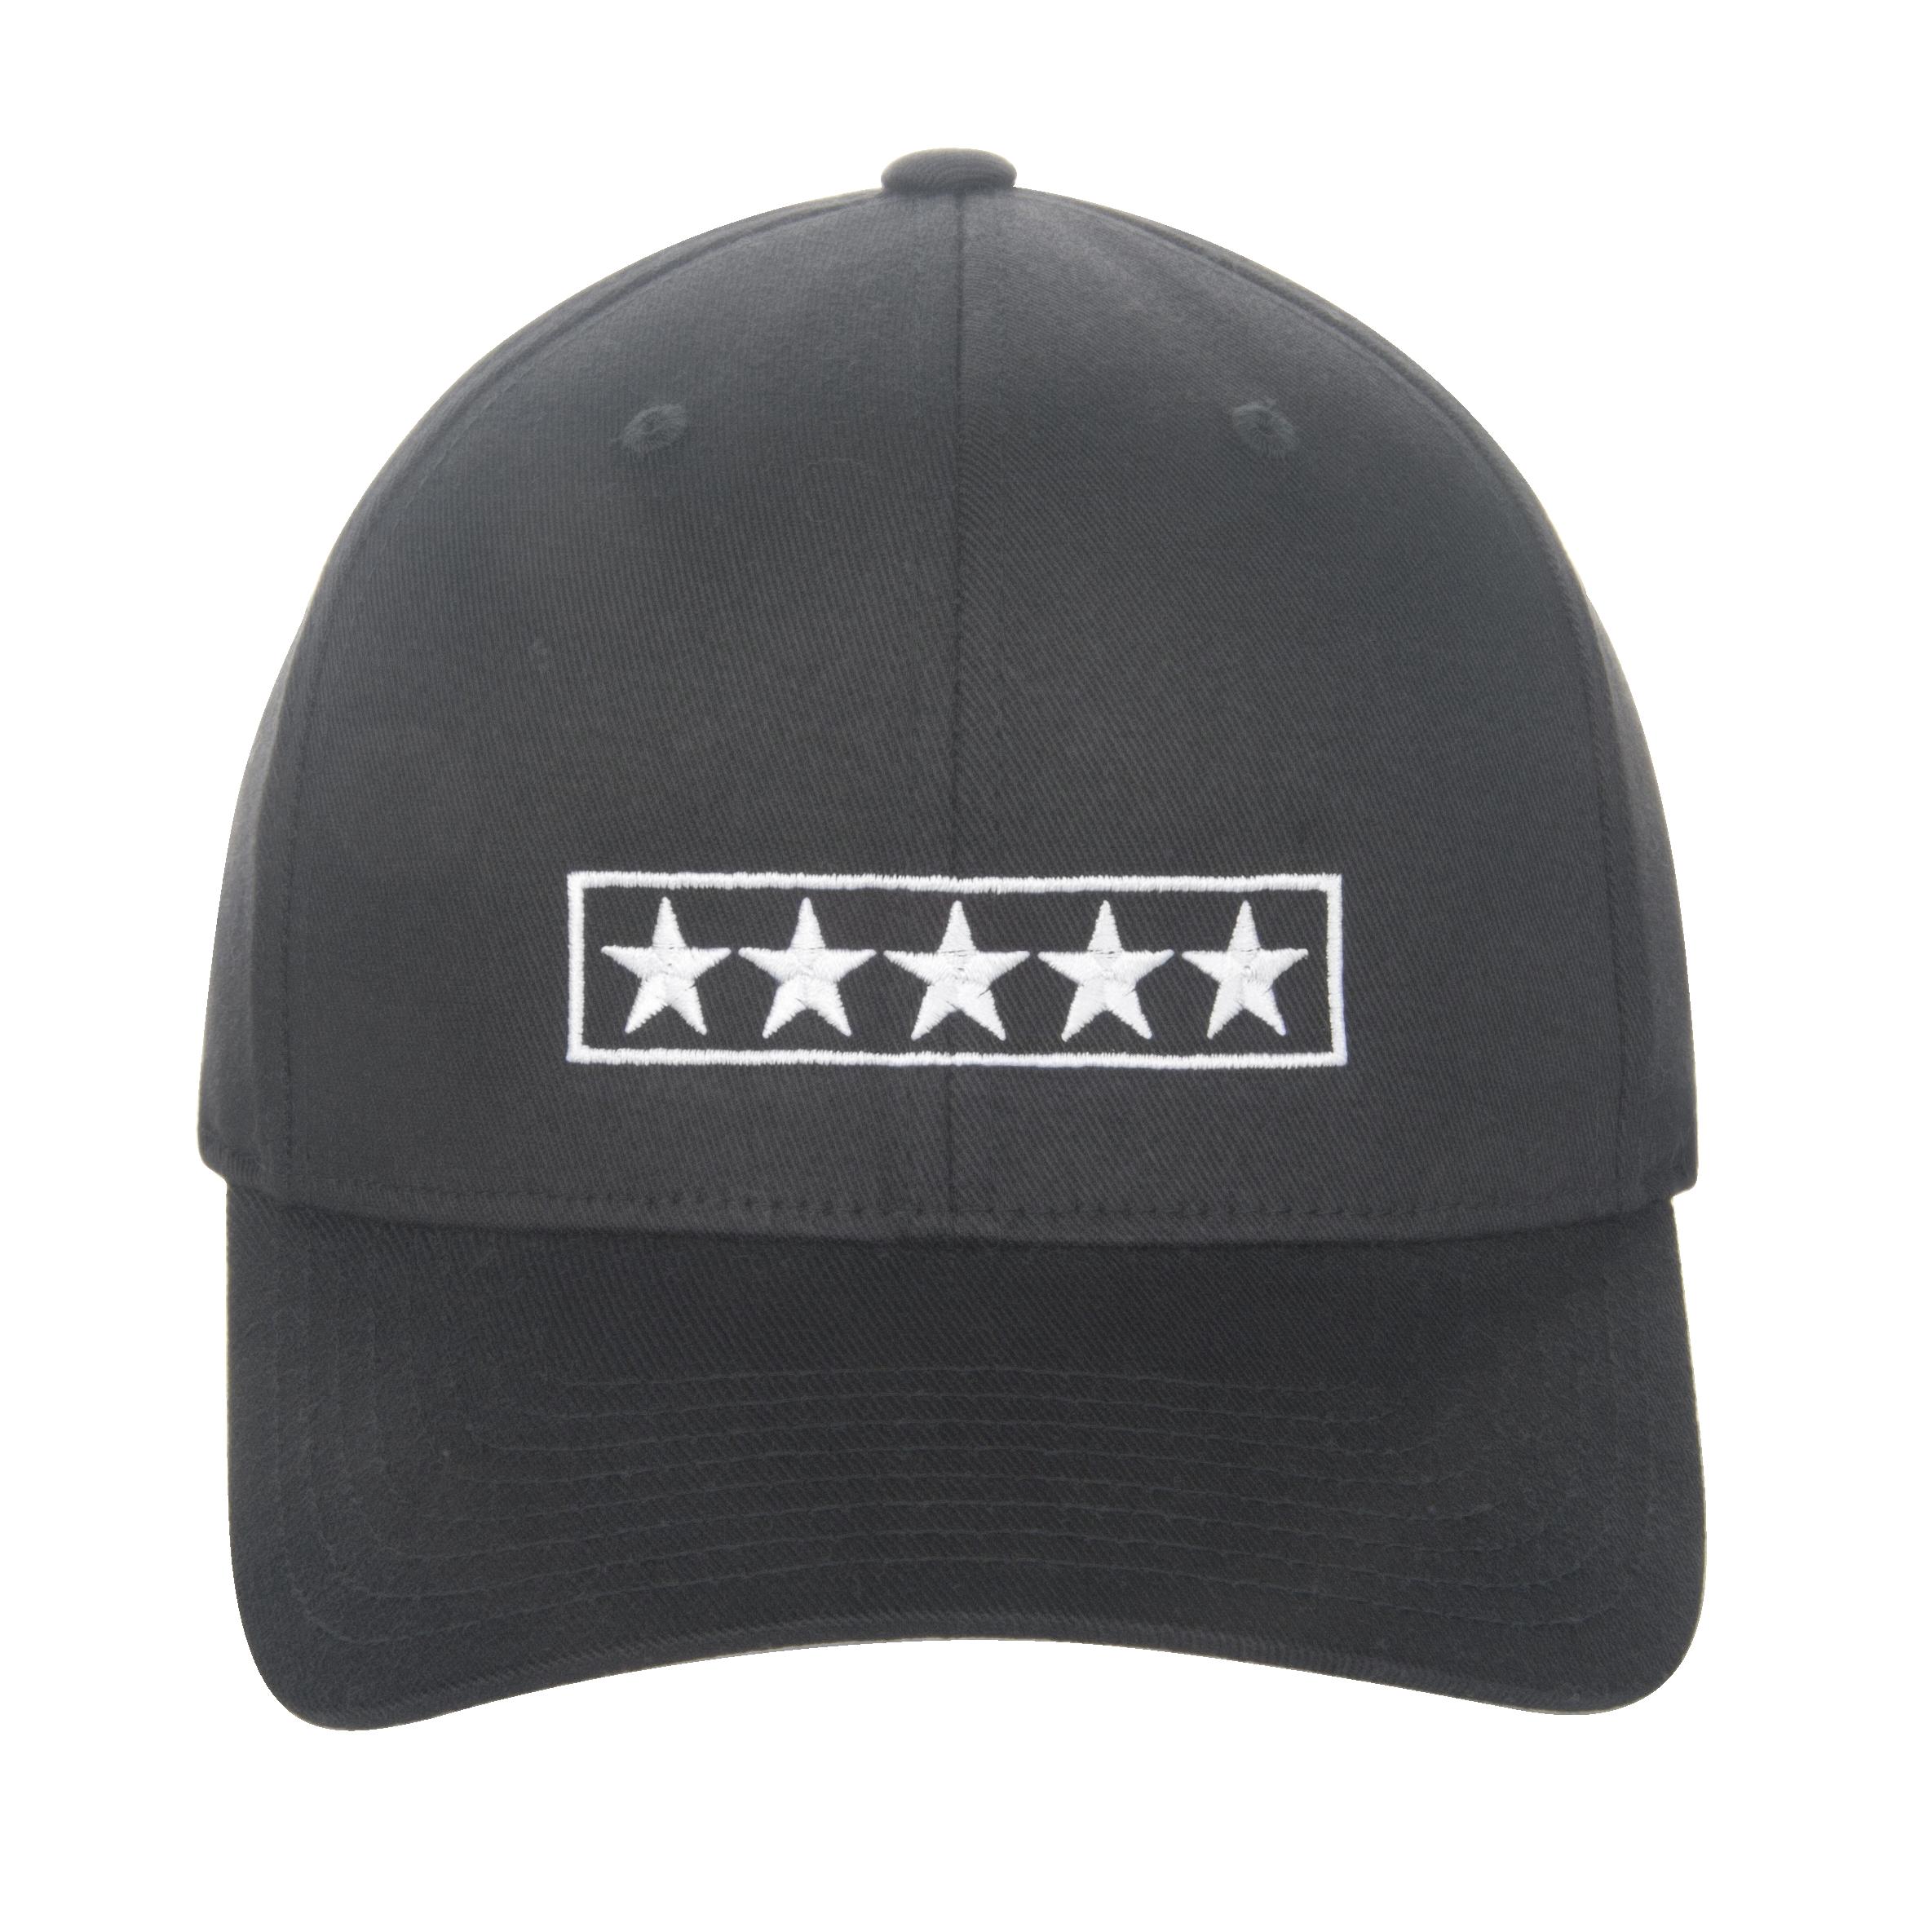 All Star Collection 5 Star Baseball Cap Cap Mens Caps